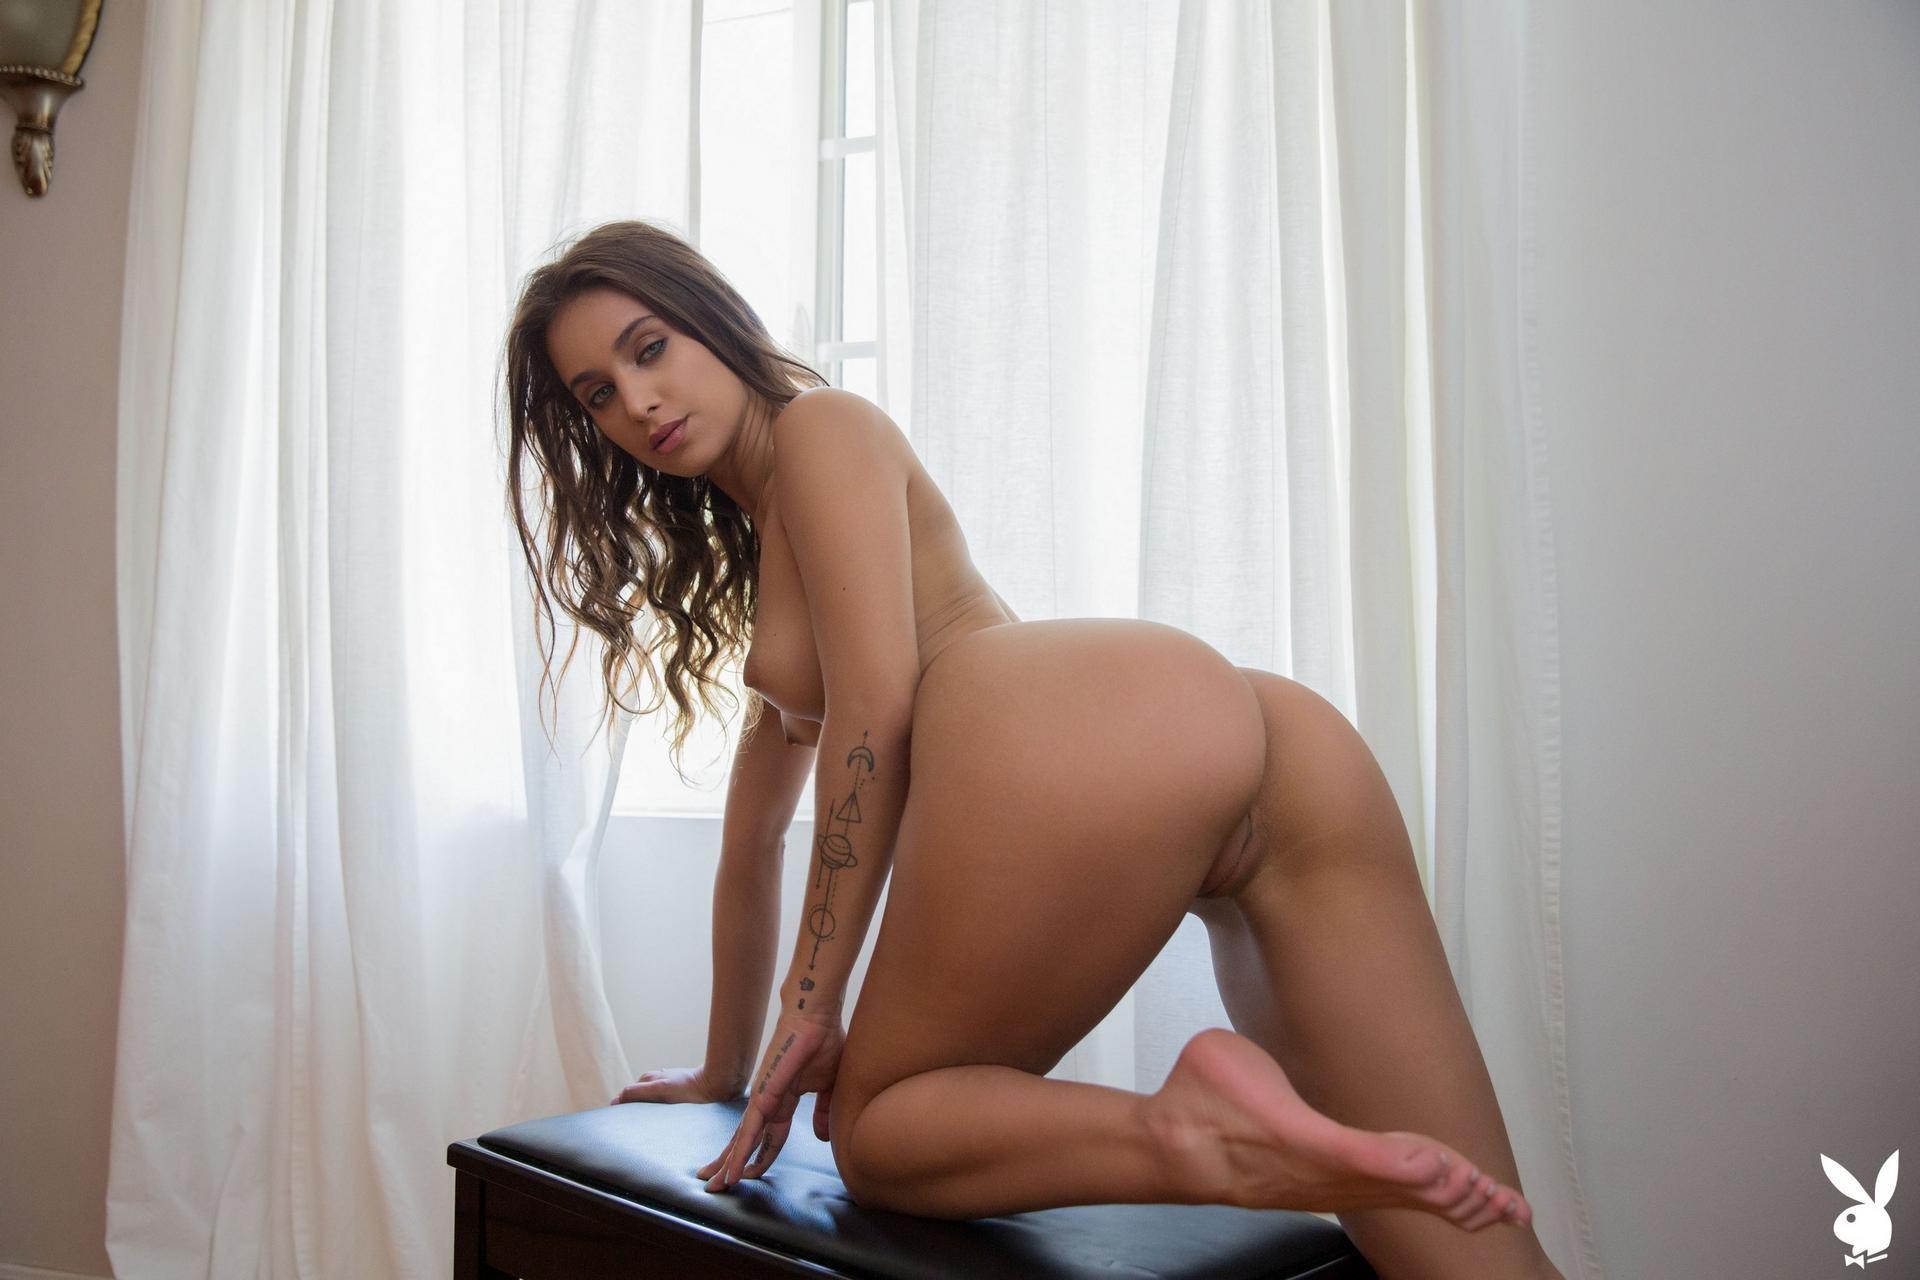 Alina Lopez, Angel Constance, Gina, Mila Azul, Uma Jolie (5)